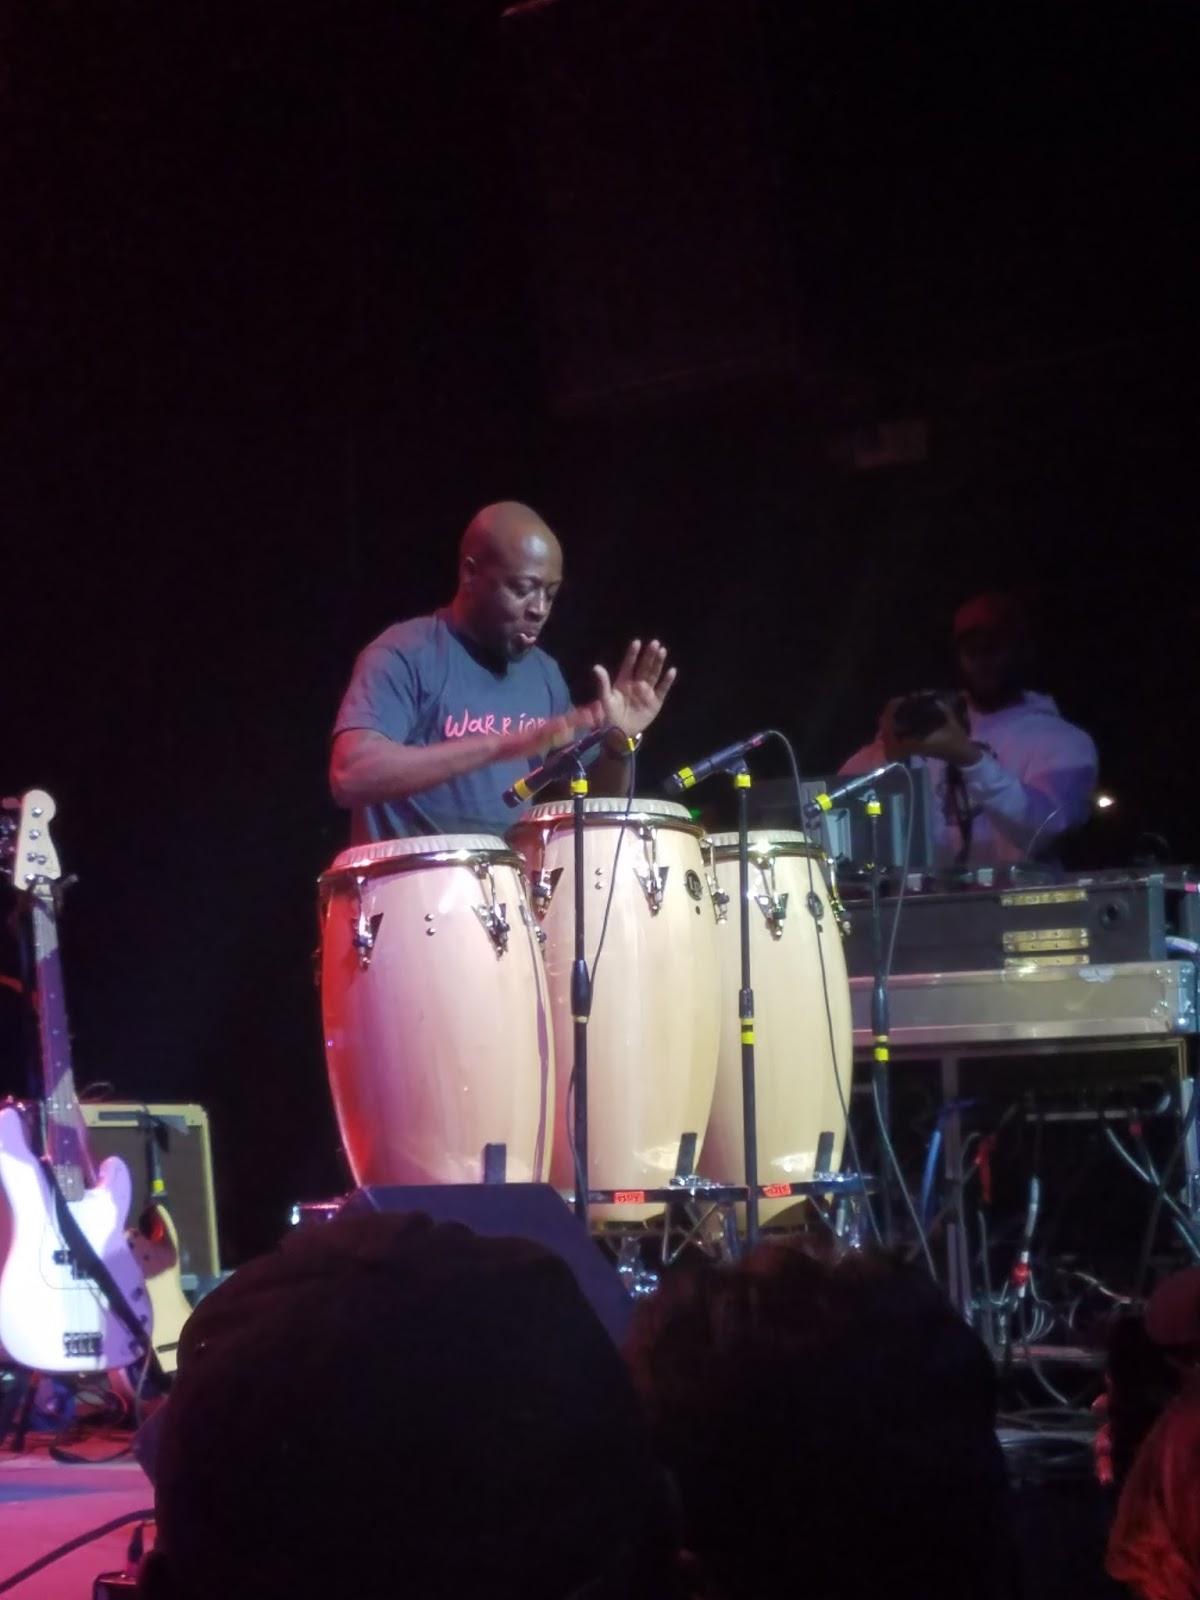 Sa Kap Fet : Wyclef, Culture, 3.14.18, MUSICMARAUDERS